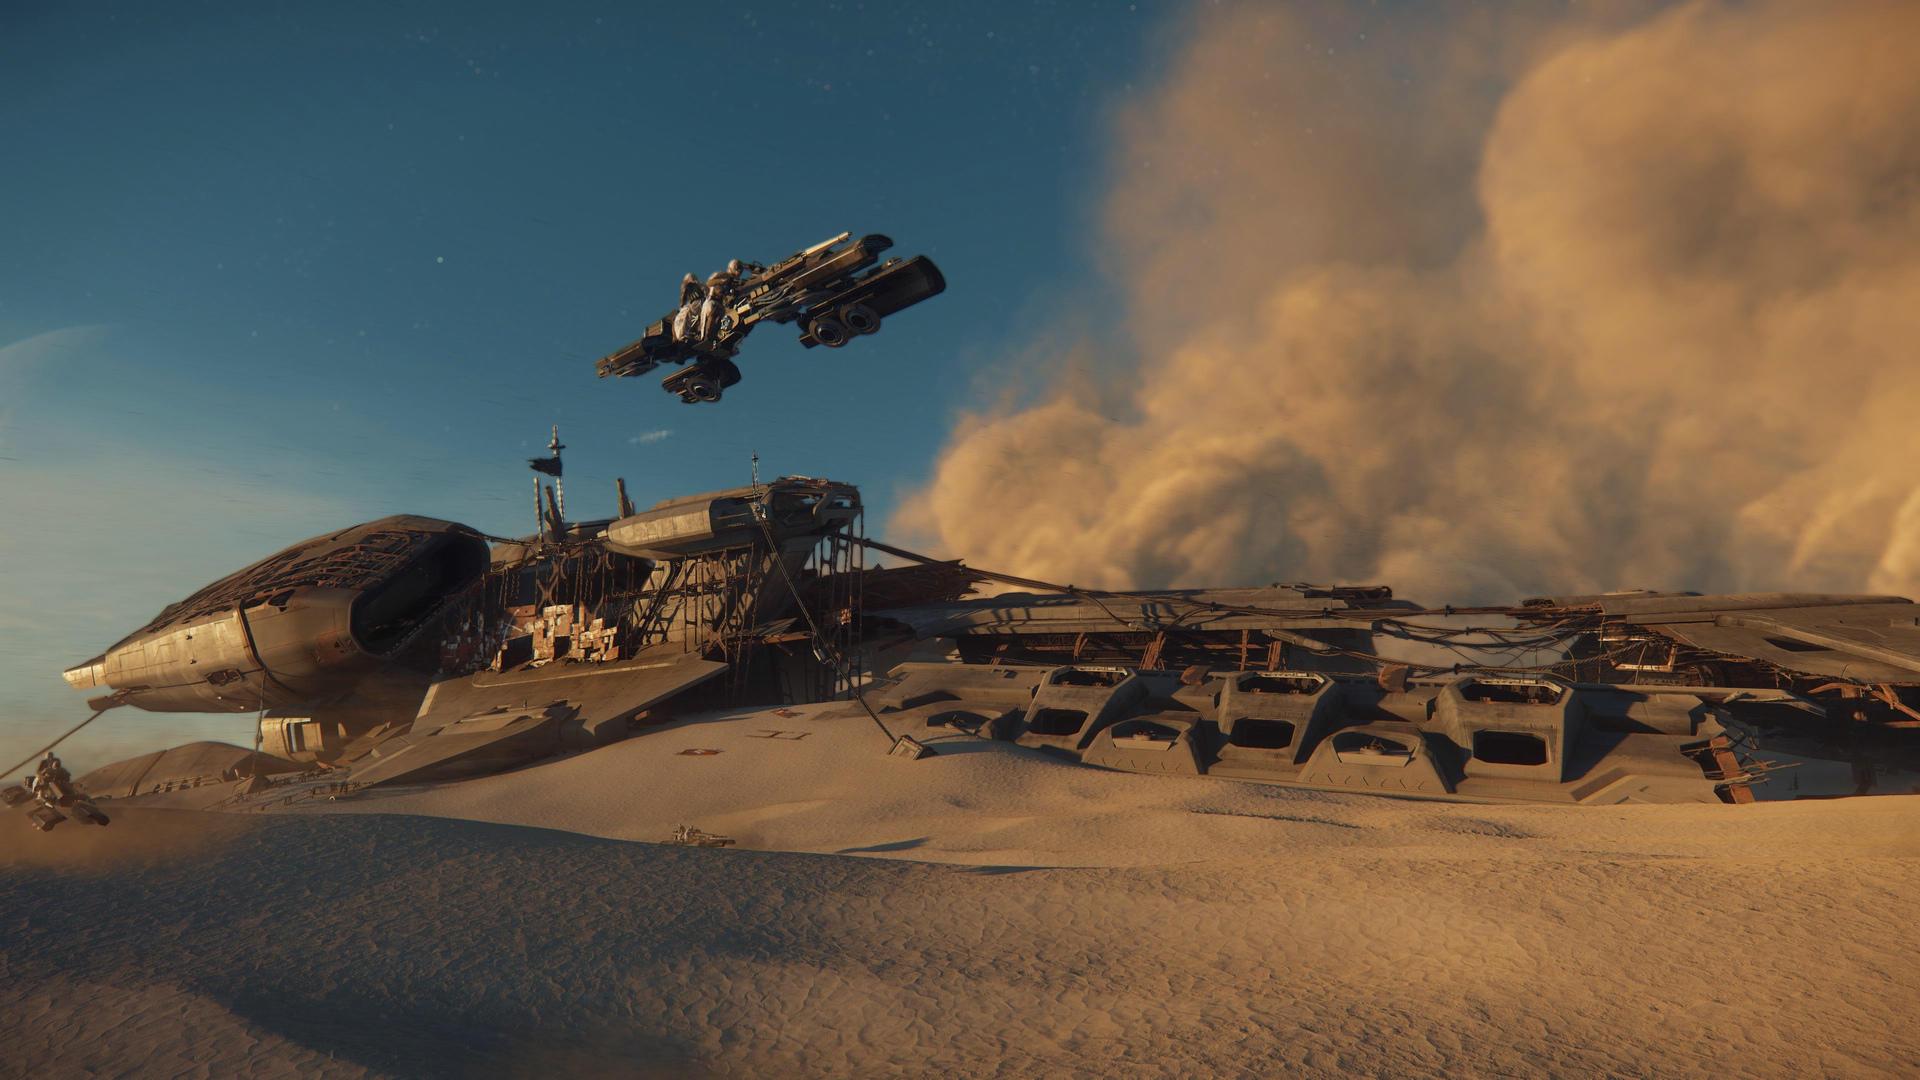 Wrak Javelina, Dragonfly, burza piaskowa